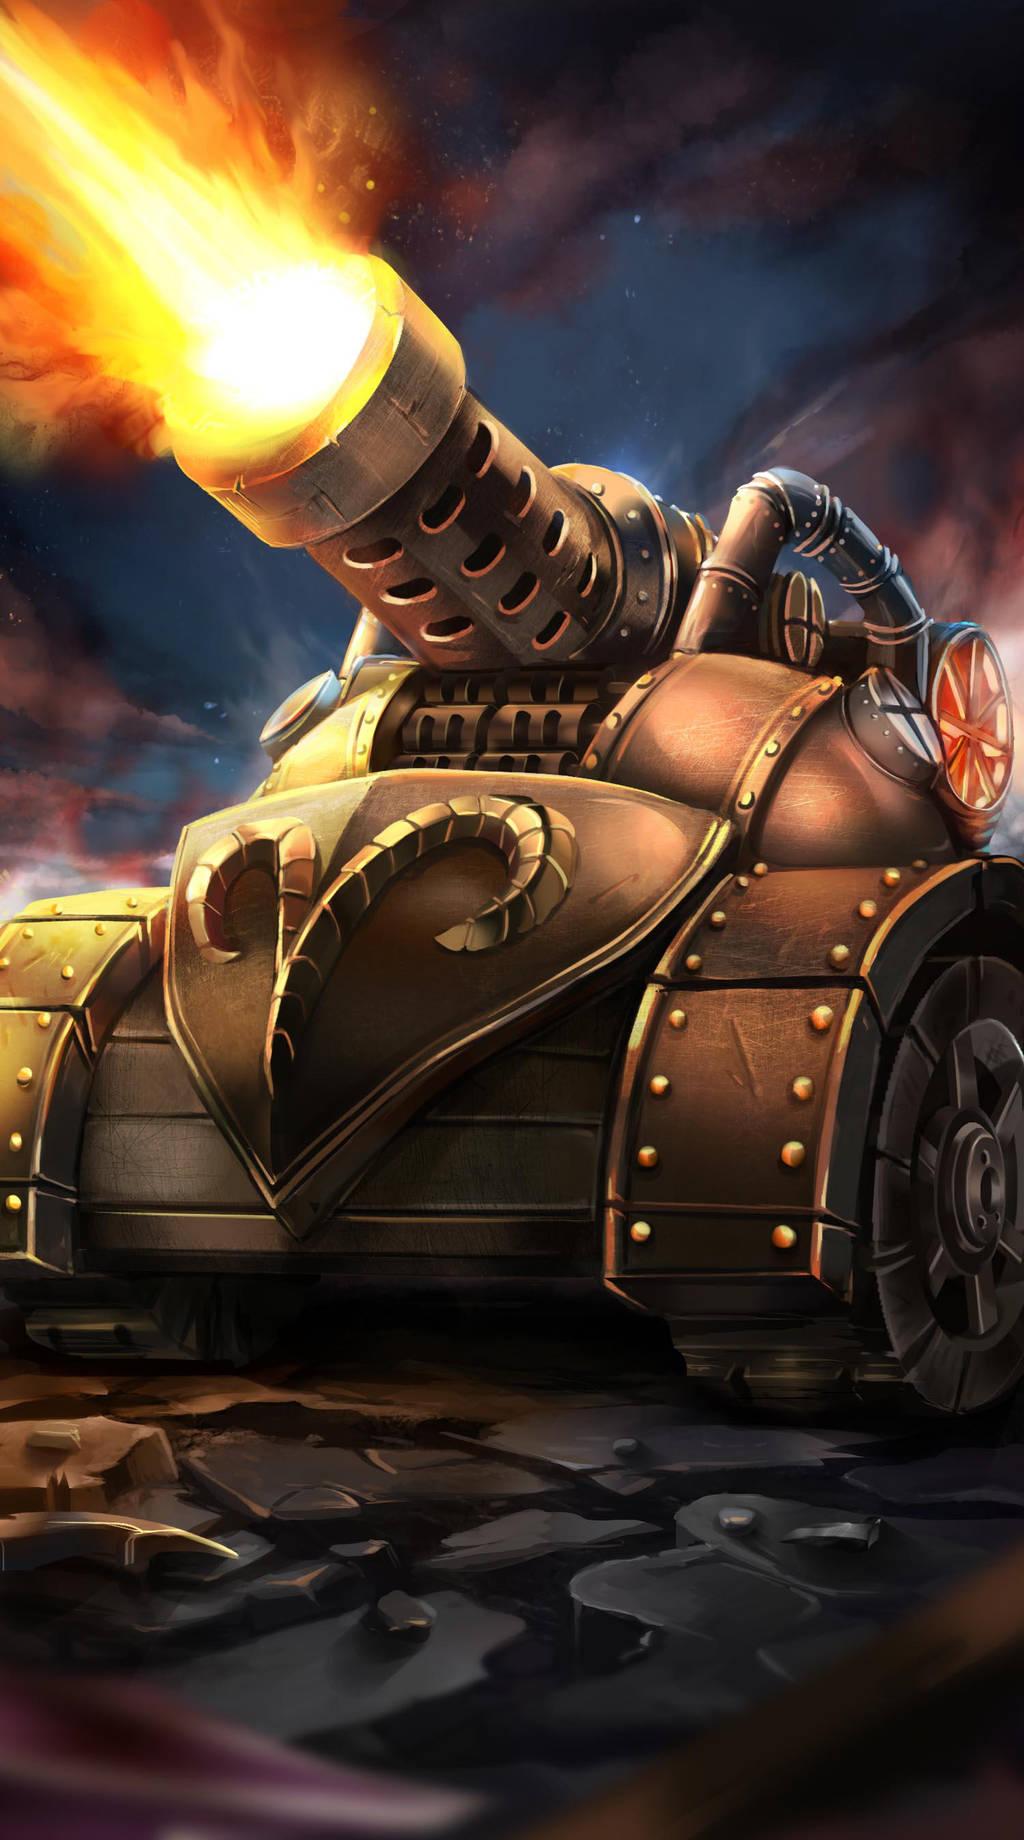 Mortar Tank from Petagon by OrionArtsStudio